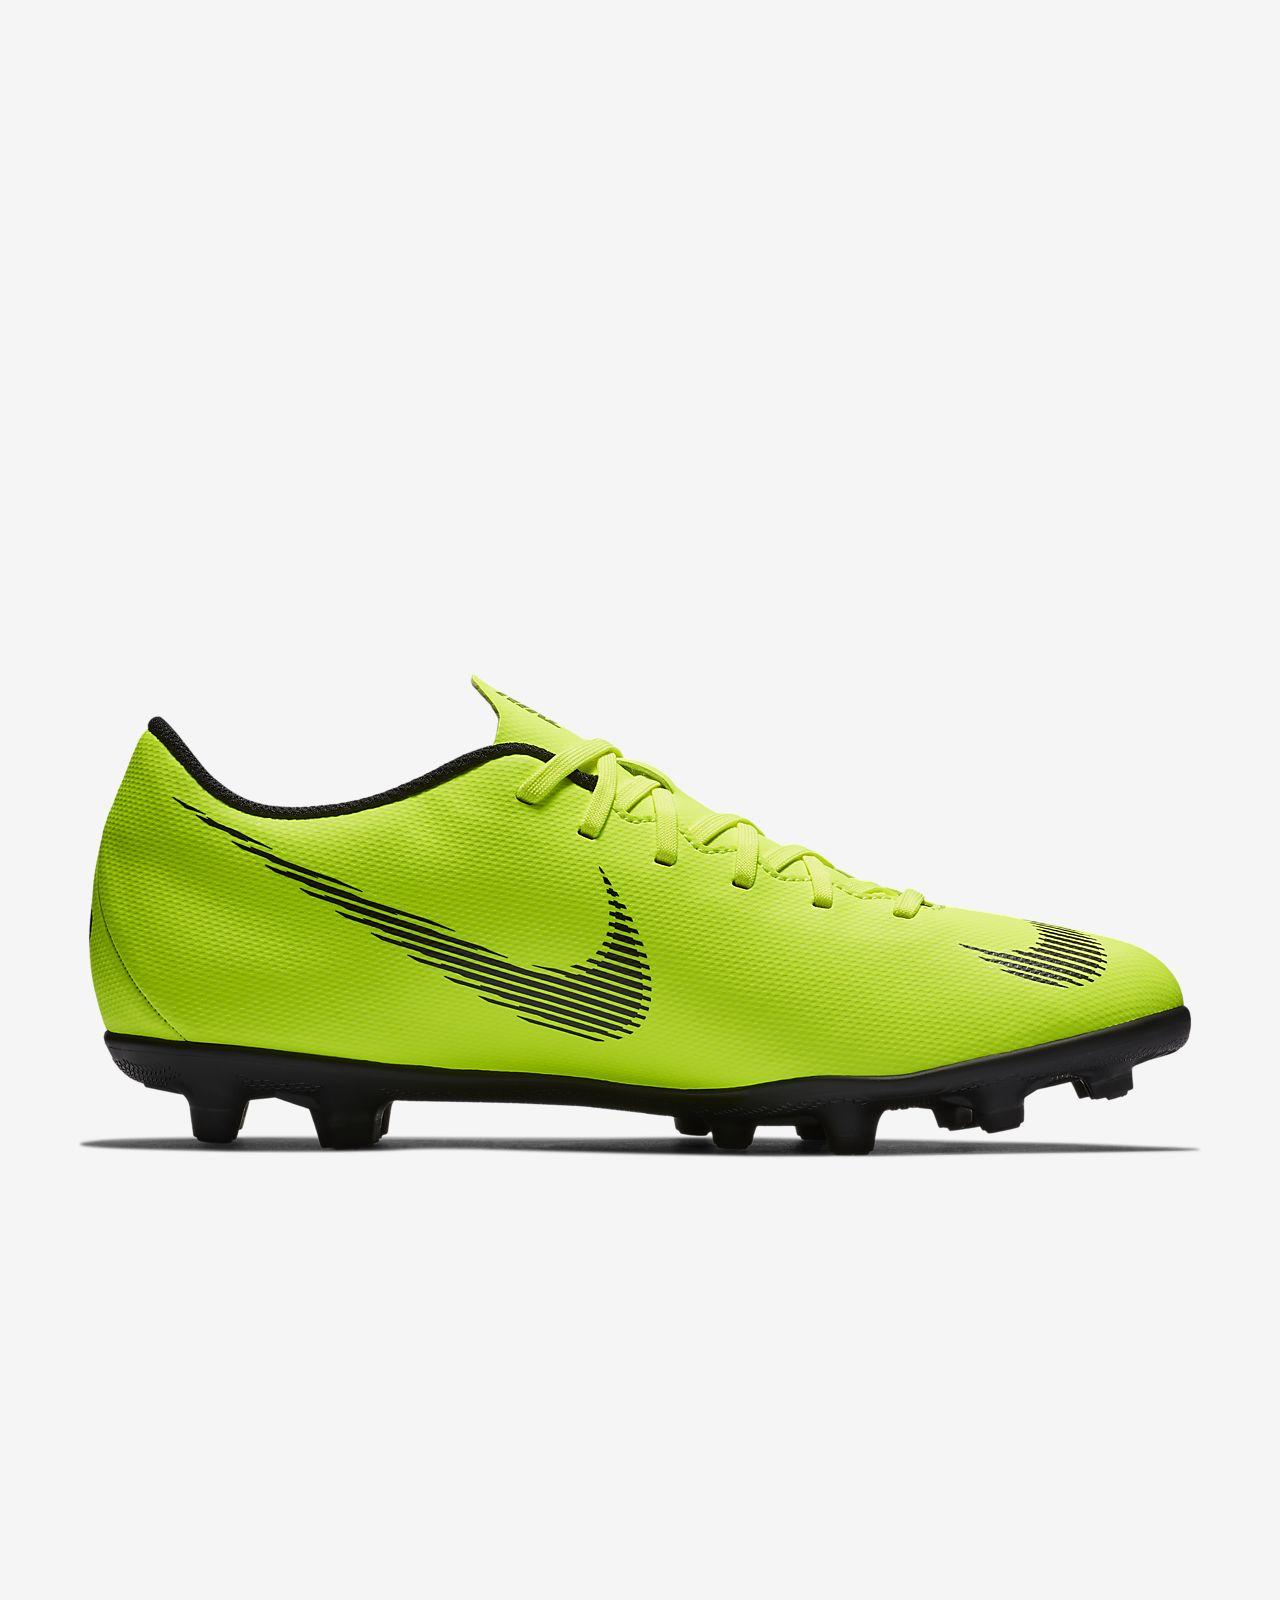 quality design cbbd0 454c2 ... Nike Mercurial Vapor XII Club Multi-Ground Soccer Cleat